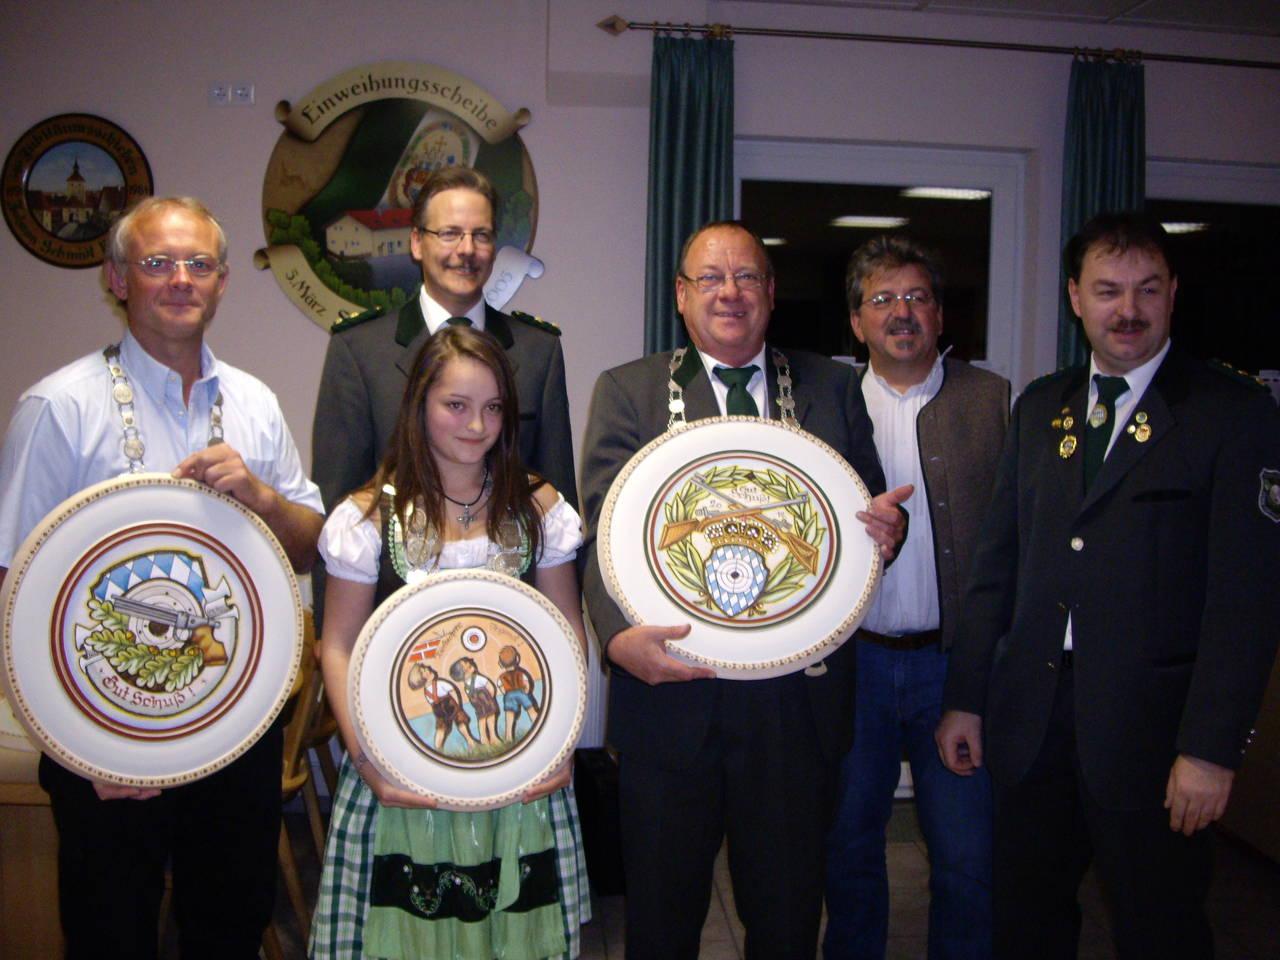 Schützenkönig 2012 / 2013